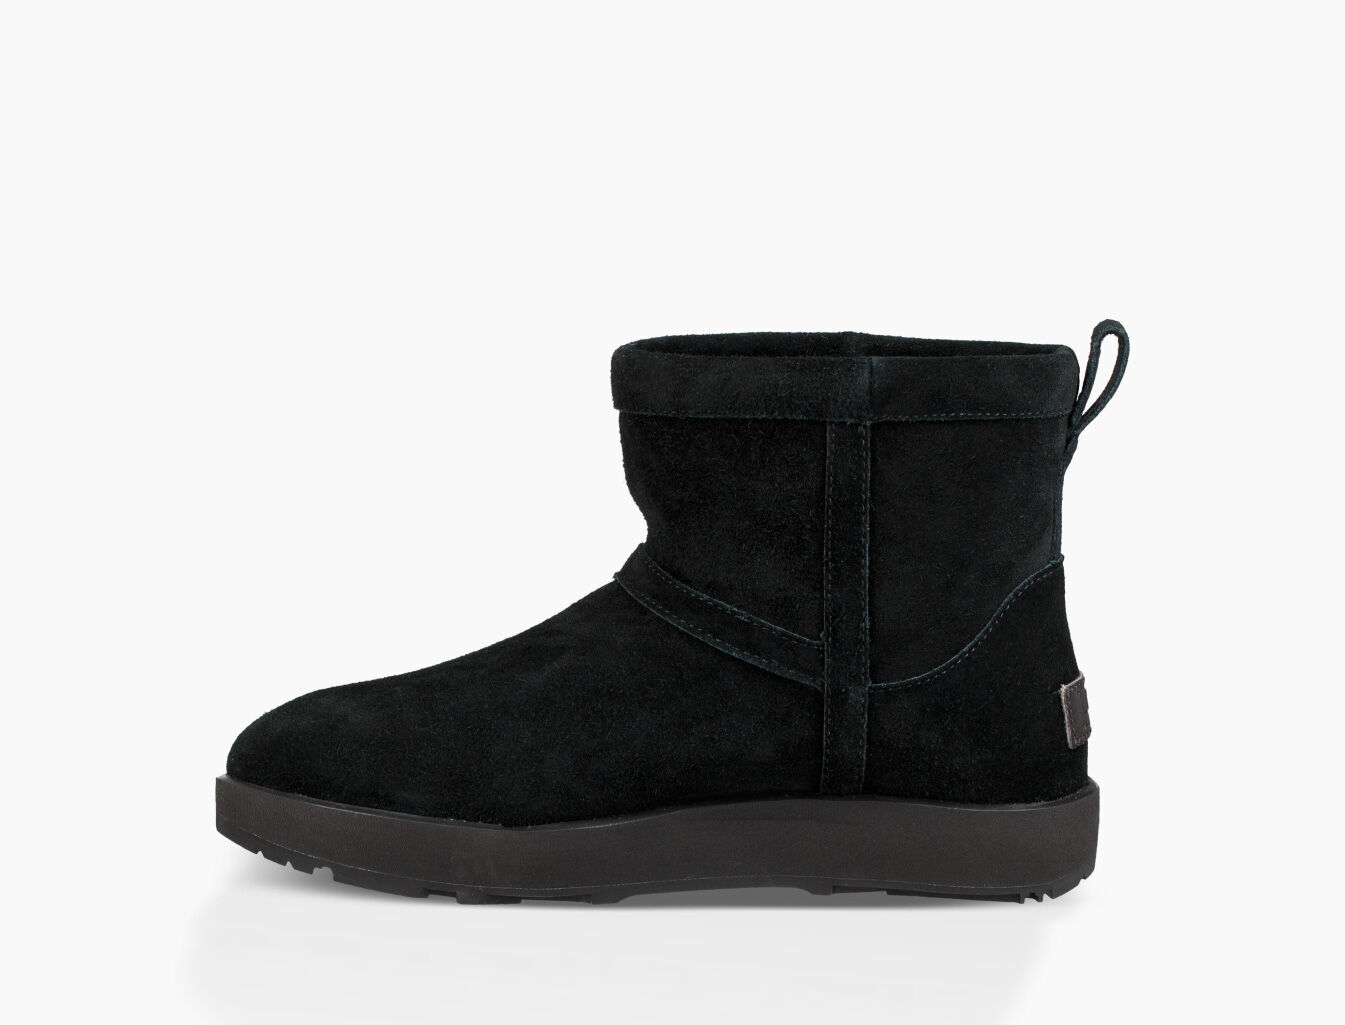 ugg australia classic mini ankle boots black ice rh lainsurancedenver com